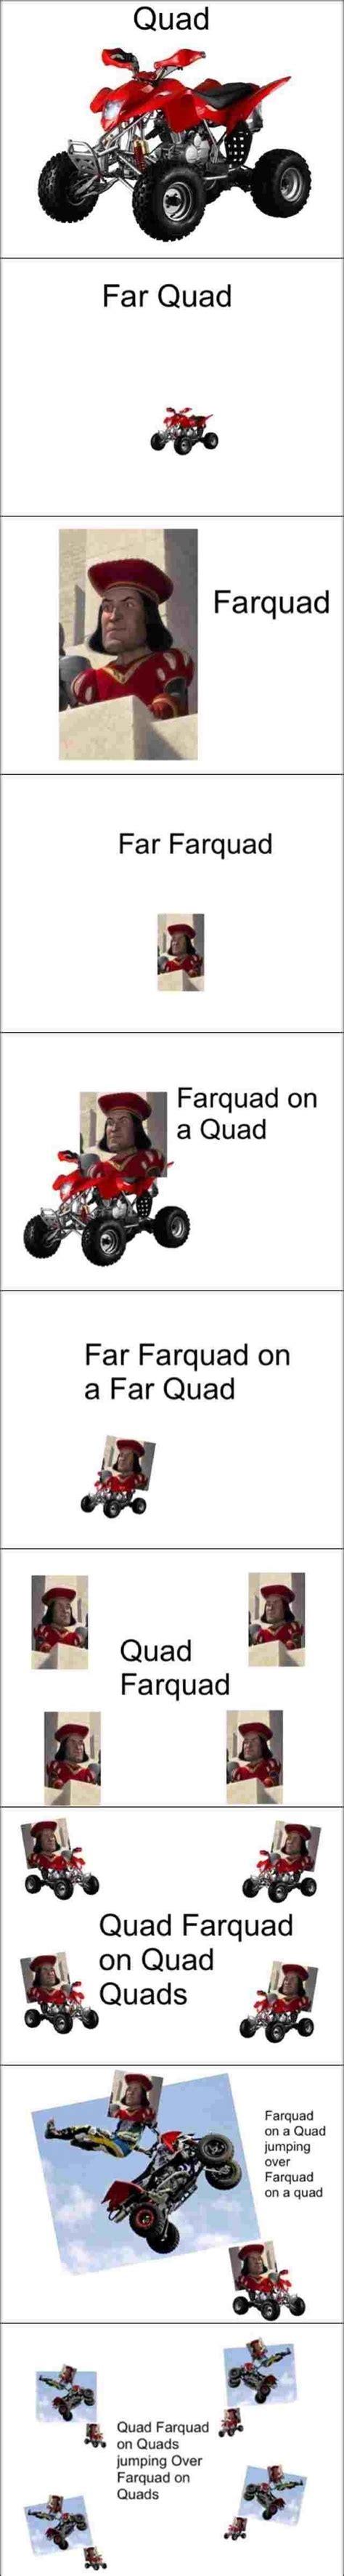 Quad Memes - the gallery for gt quad memes